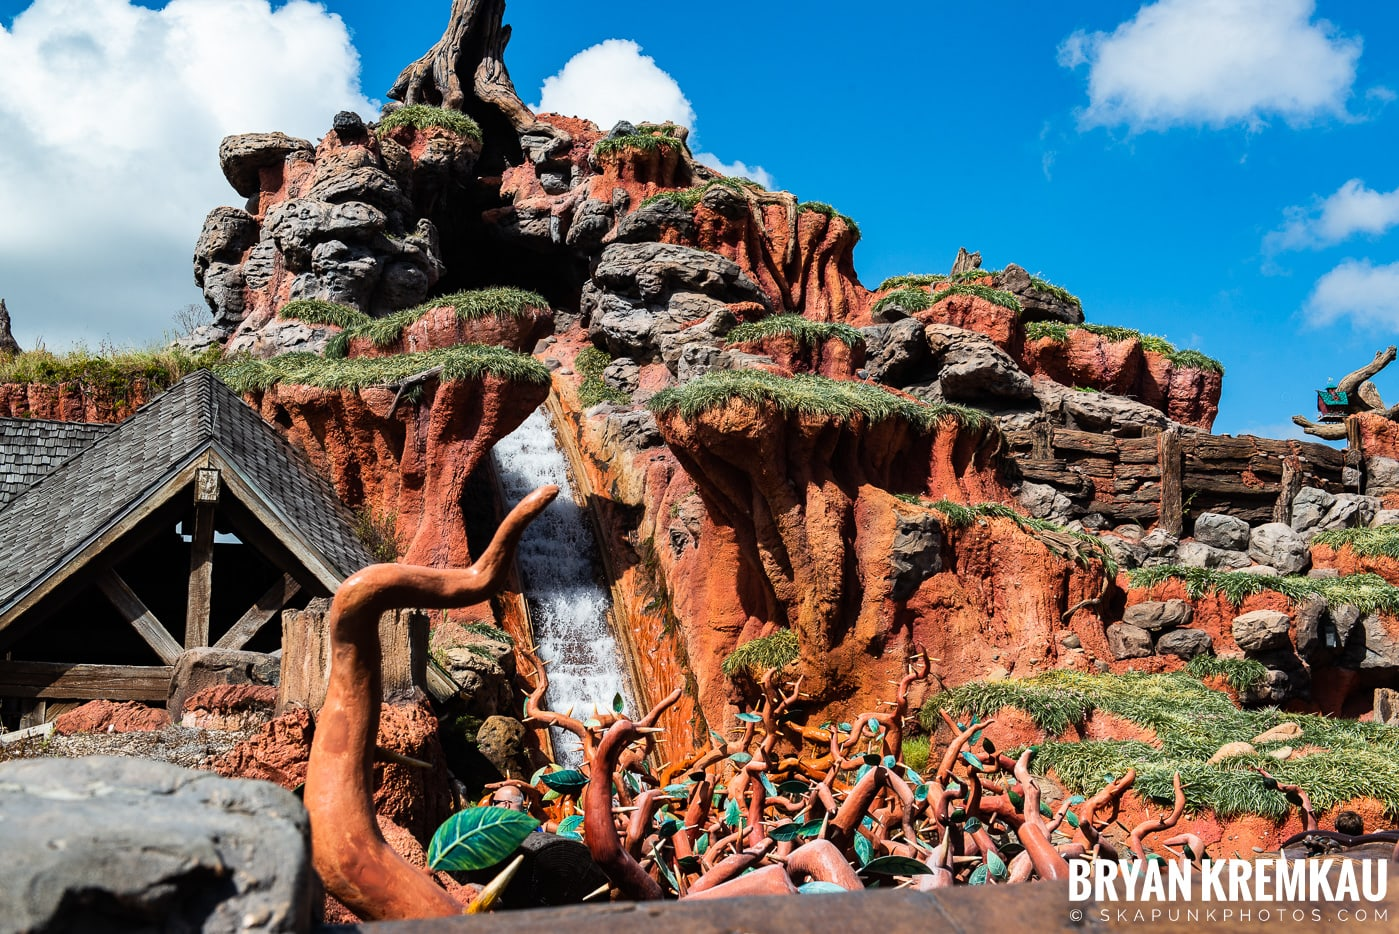 Walt Disney World Vacation: Day 6 (Magic Kingdom, Epcot, Disney's Hollywood Studios) - 10.4.19 (31)